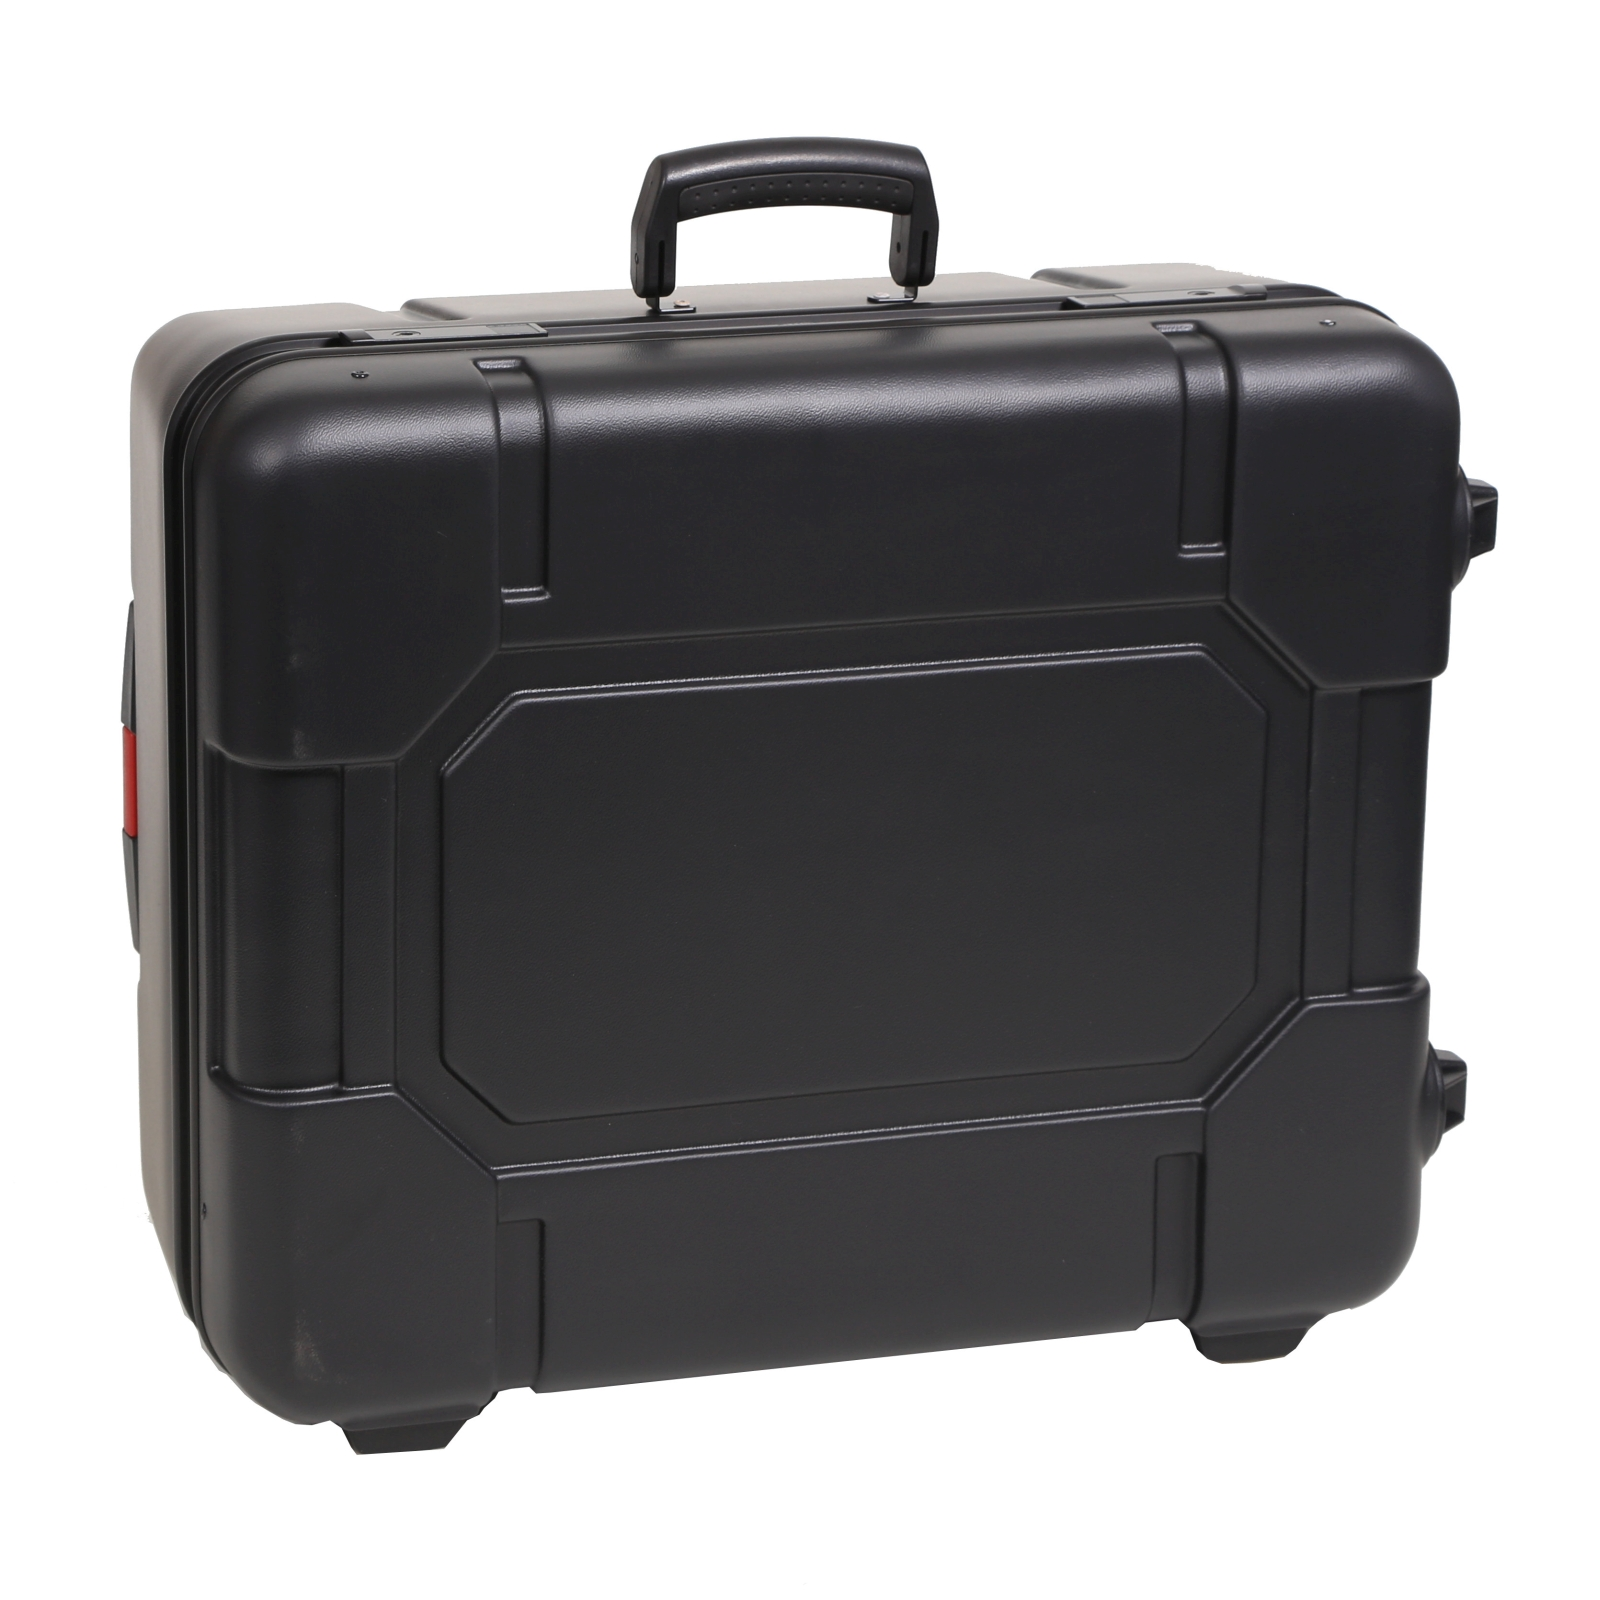 bwh koffer kunststoffkoffer typ rs3 schwarz 2 rollen g nstig kaufen koffermarkt. Black Bedroom Furniture Sets. Home Design Ideas